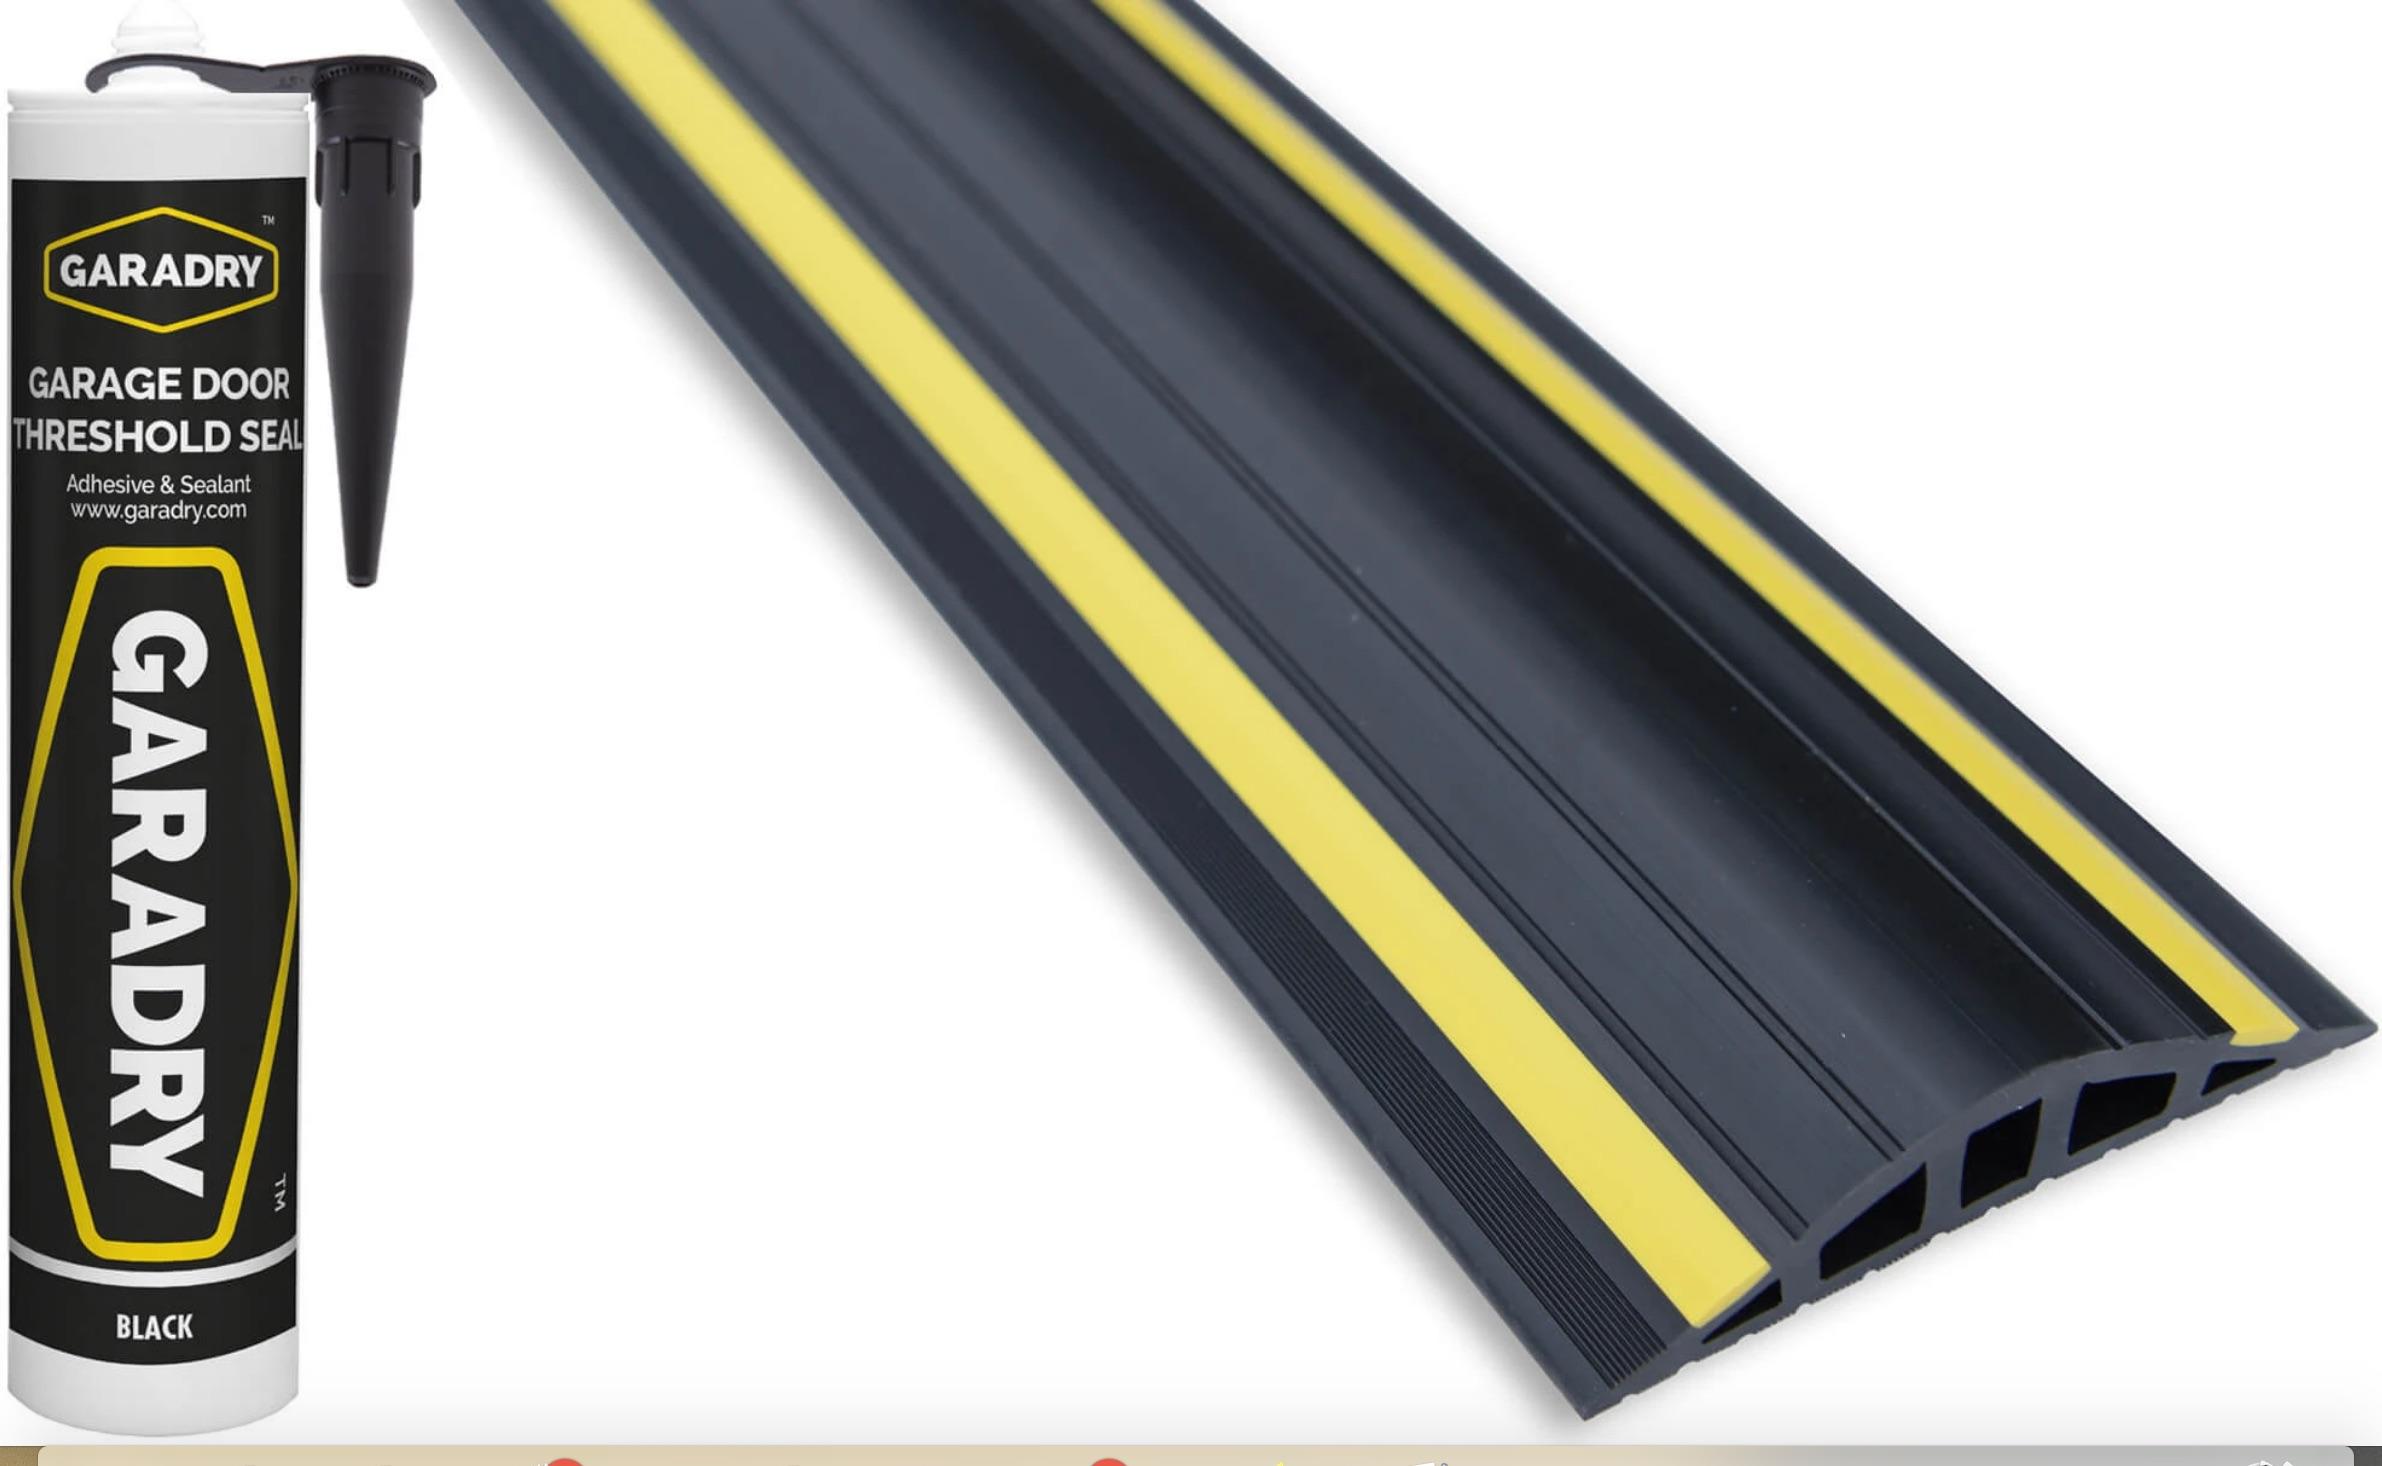 25mm High x 5.56m - 18 foot 3 Long 2 x adhesives